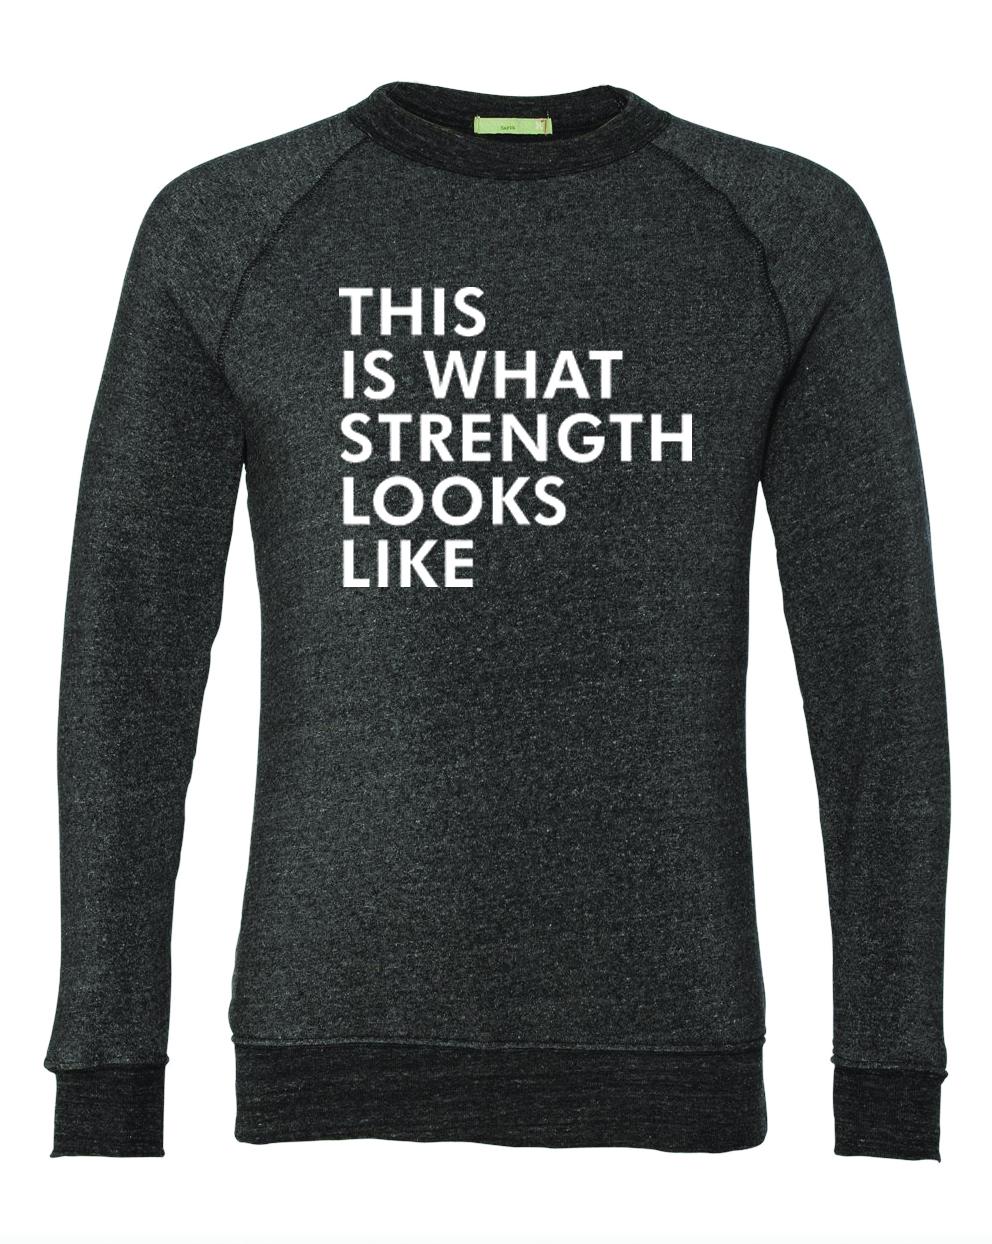 STRENGTH_sweatshirt_ecoblk.JPG